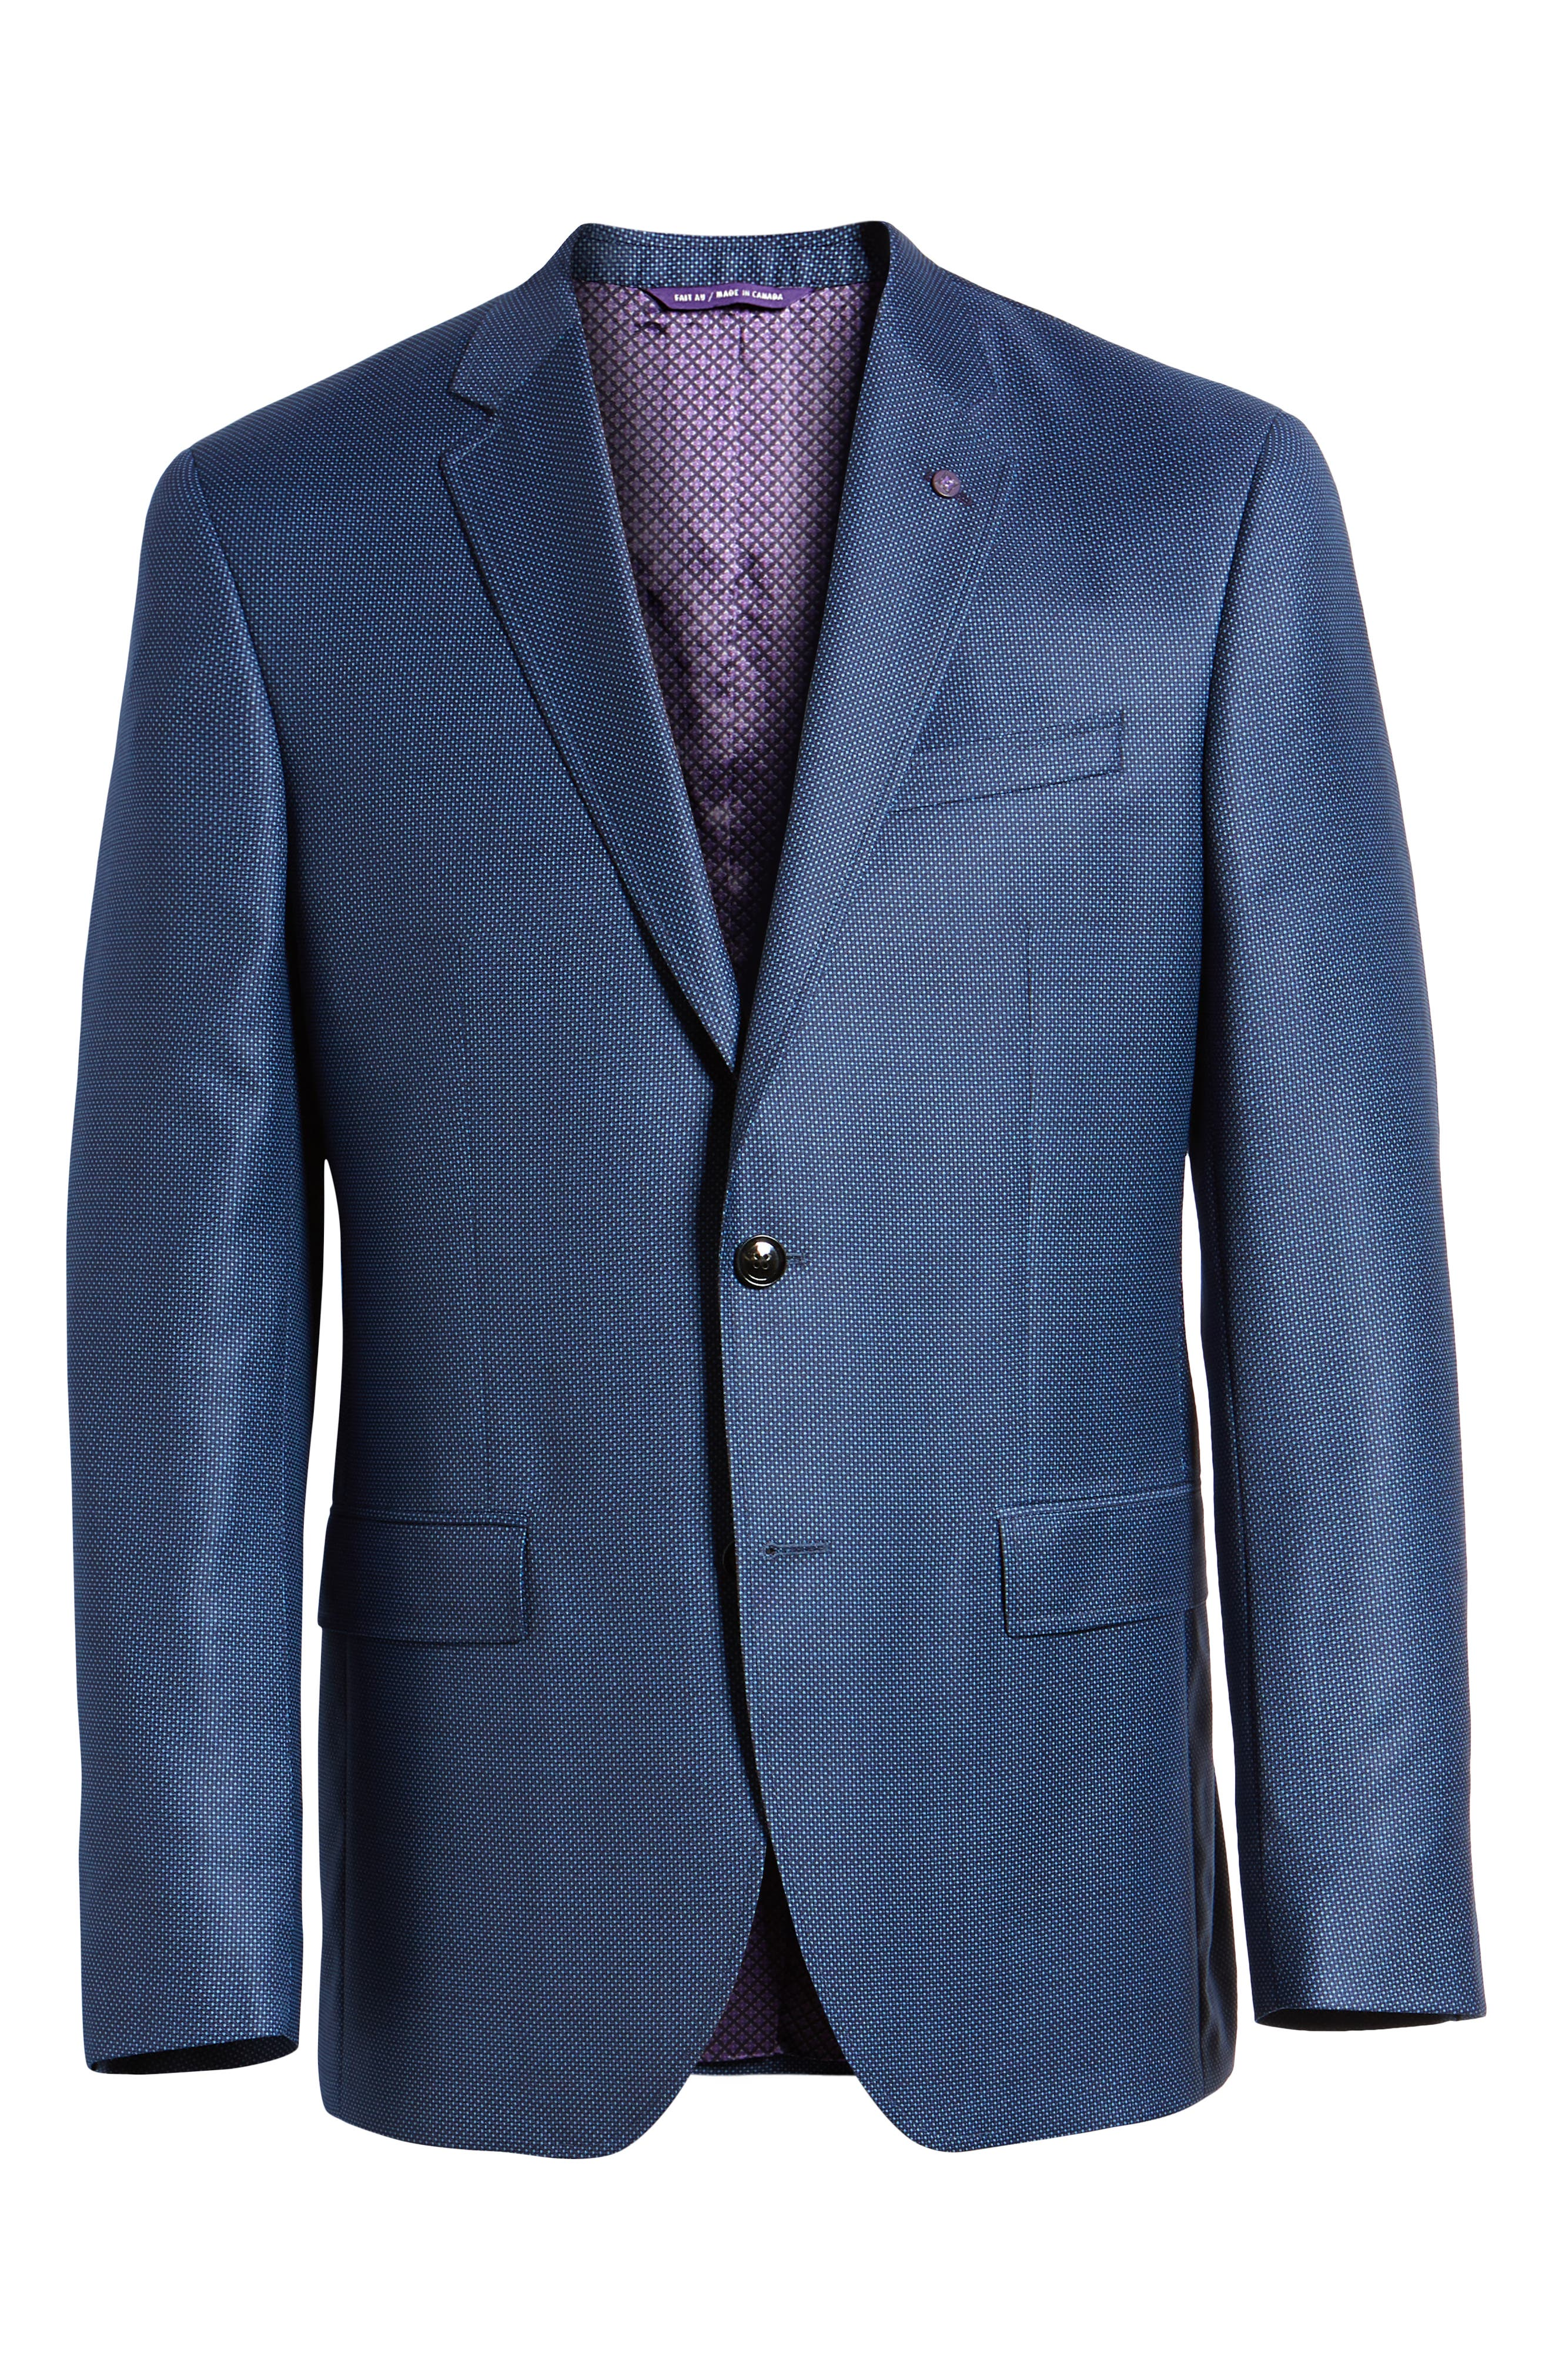 Jay Trim Fit Microdot Wool Sport Coat,                             Alternate thumbnail 5, color,                             400